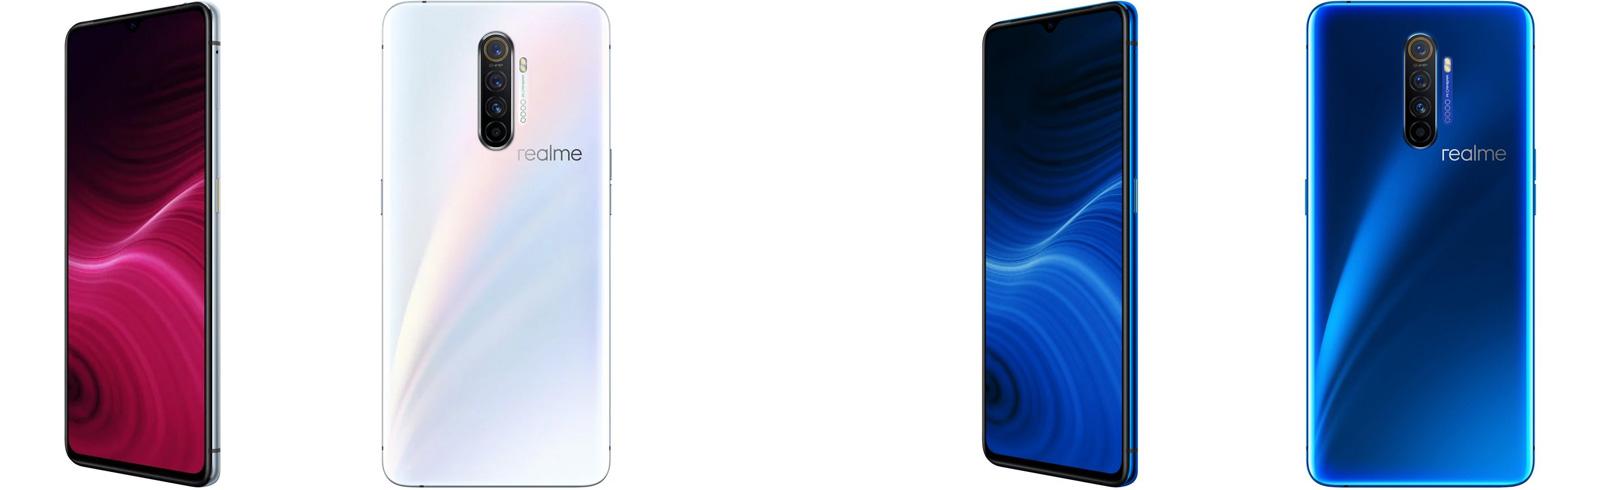 Realme X2 Pro and Realme 5s are unveiled in India